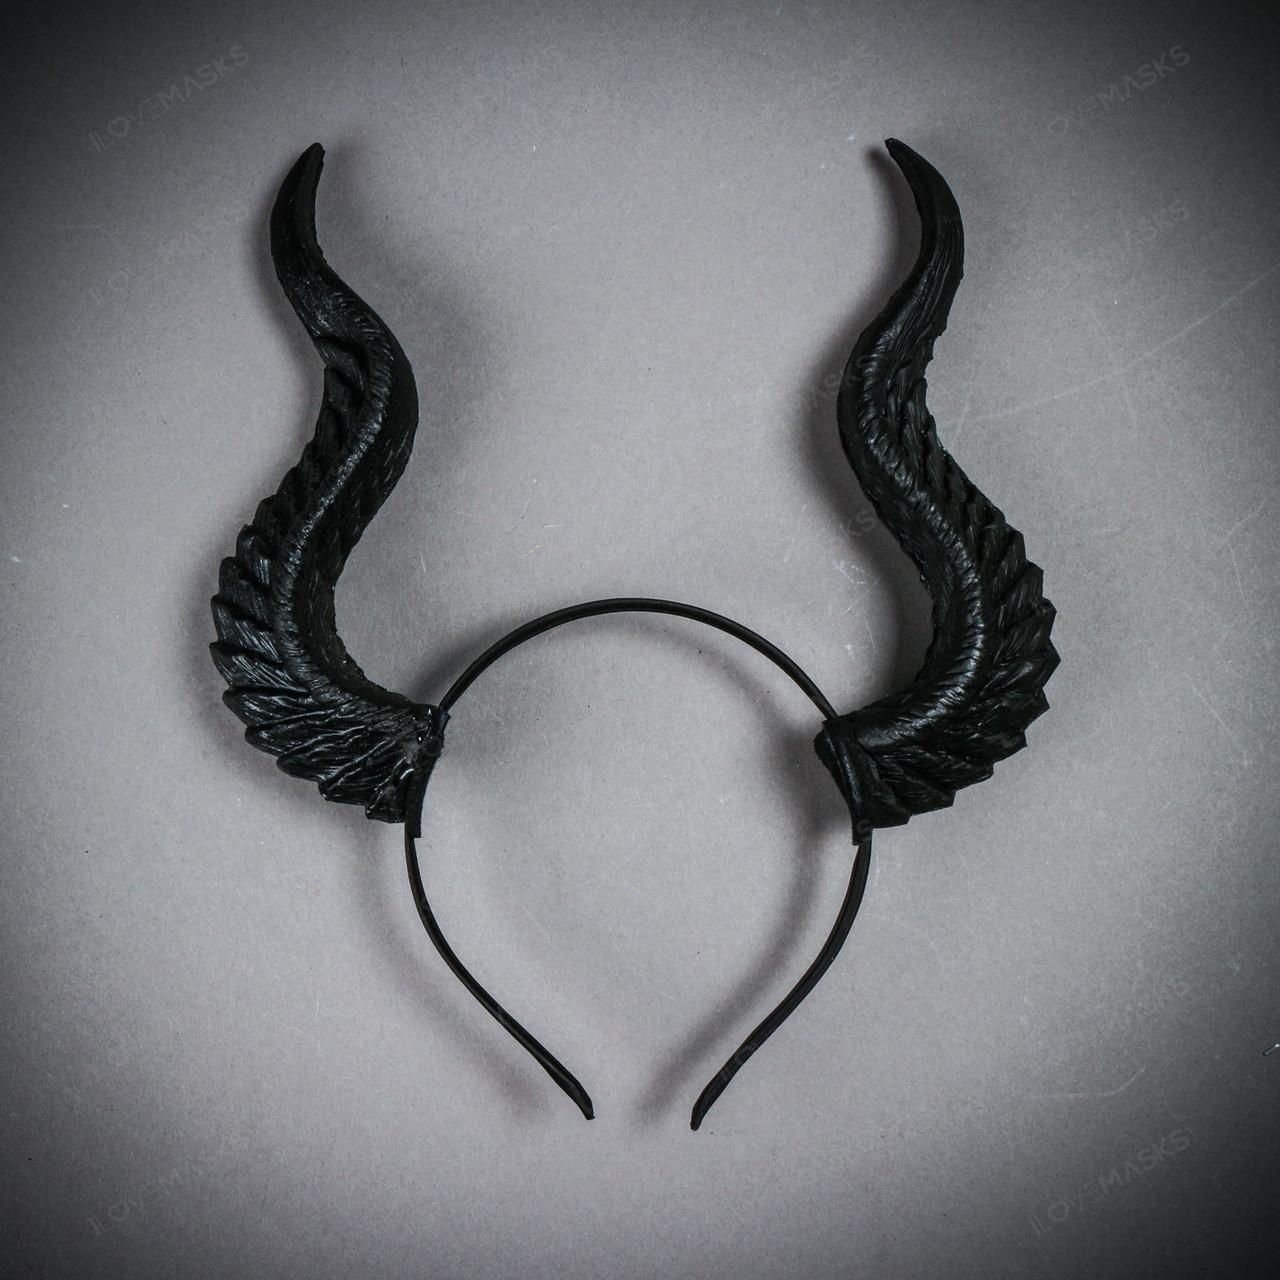 Details about  /Black Shimmer Metallic Headband